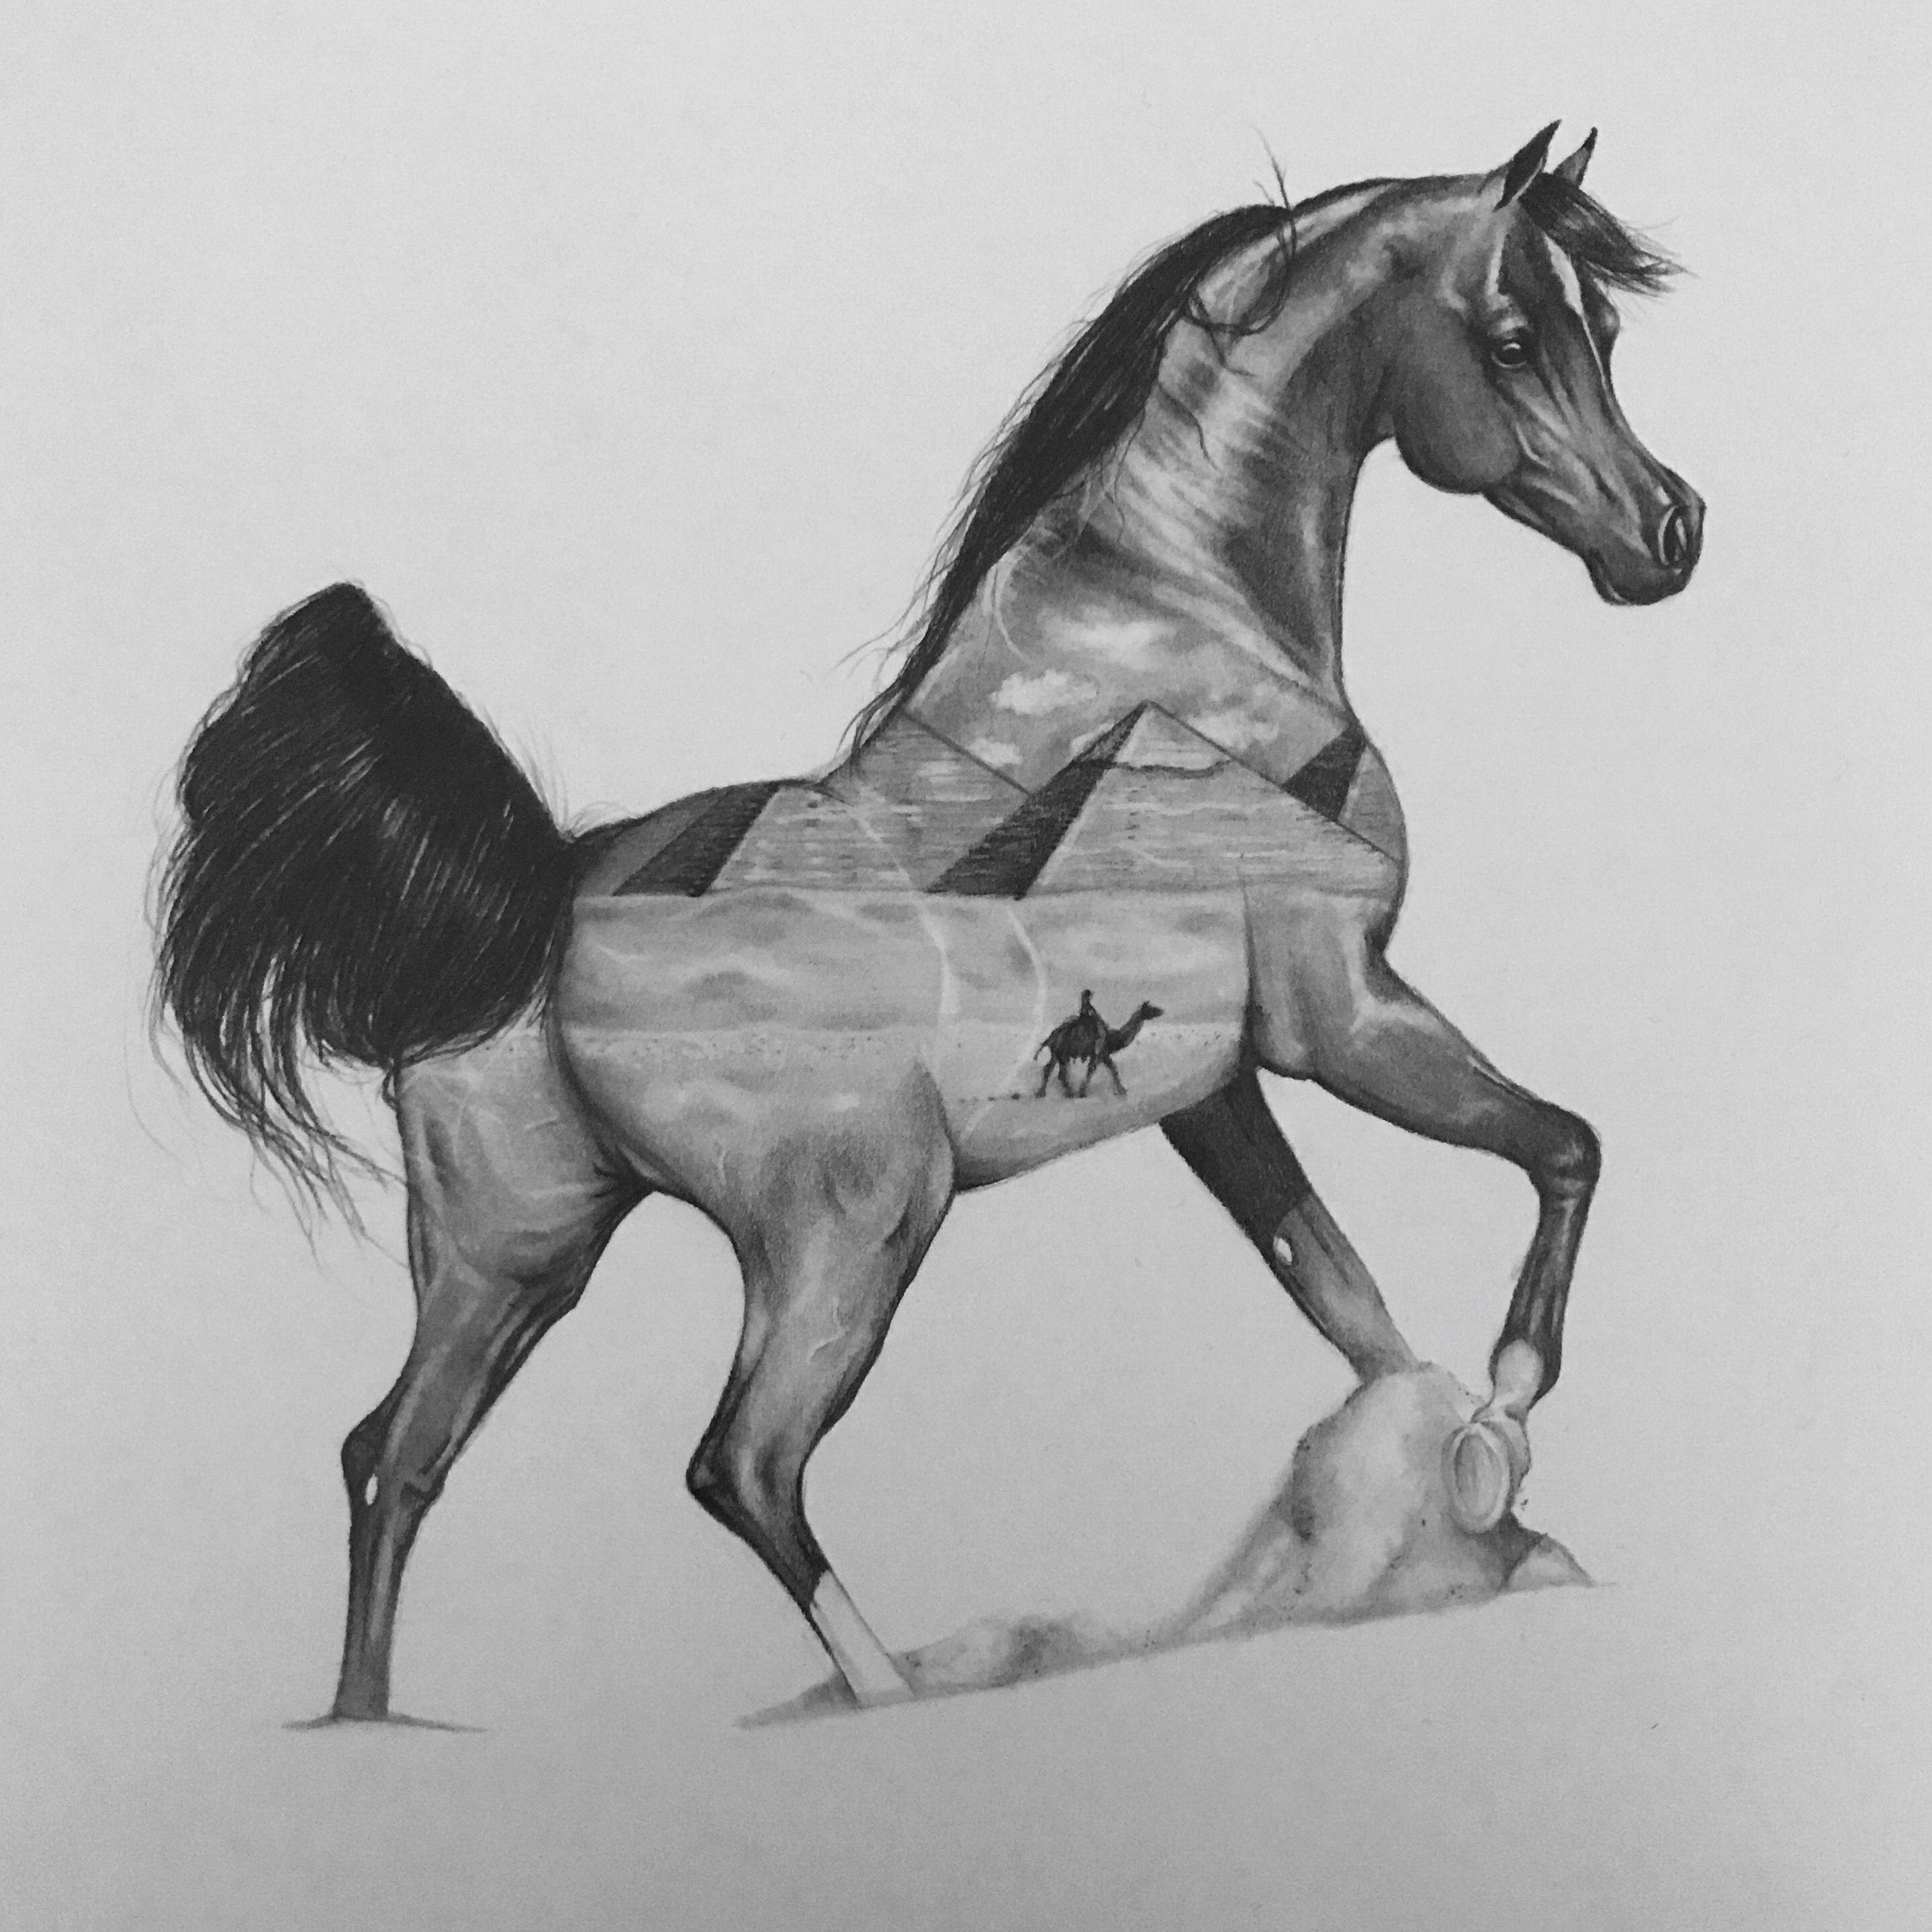 desert horse drawing pencil koń rysunek Rysunek